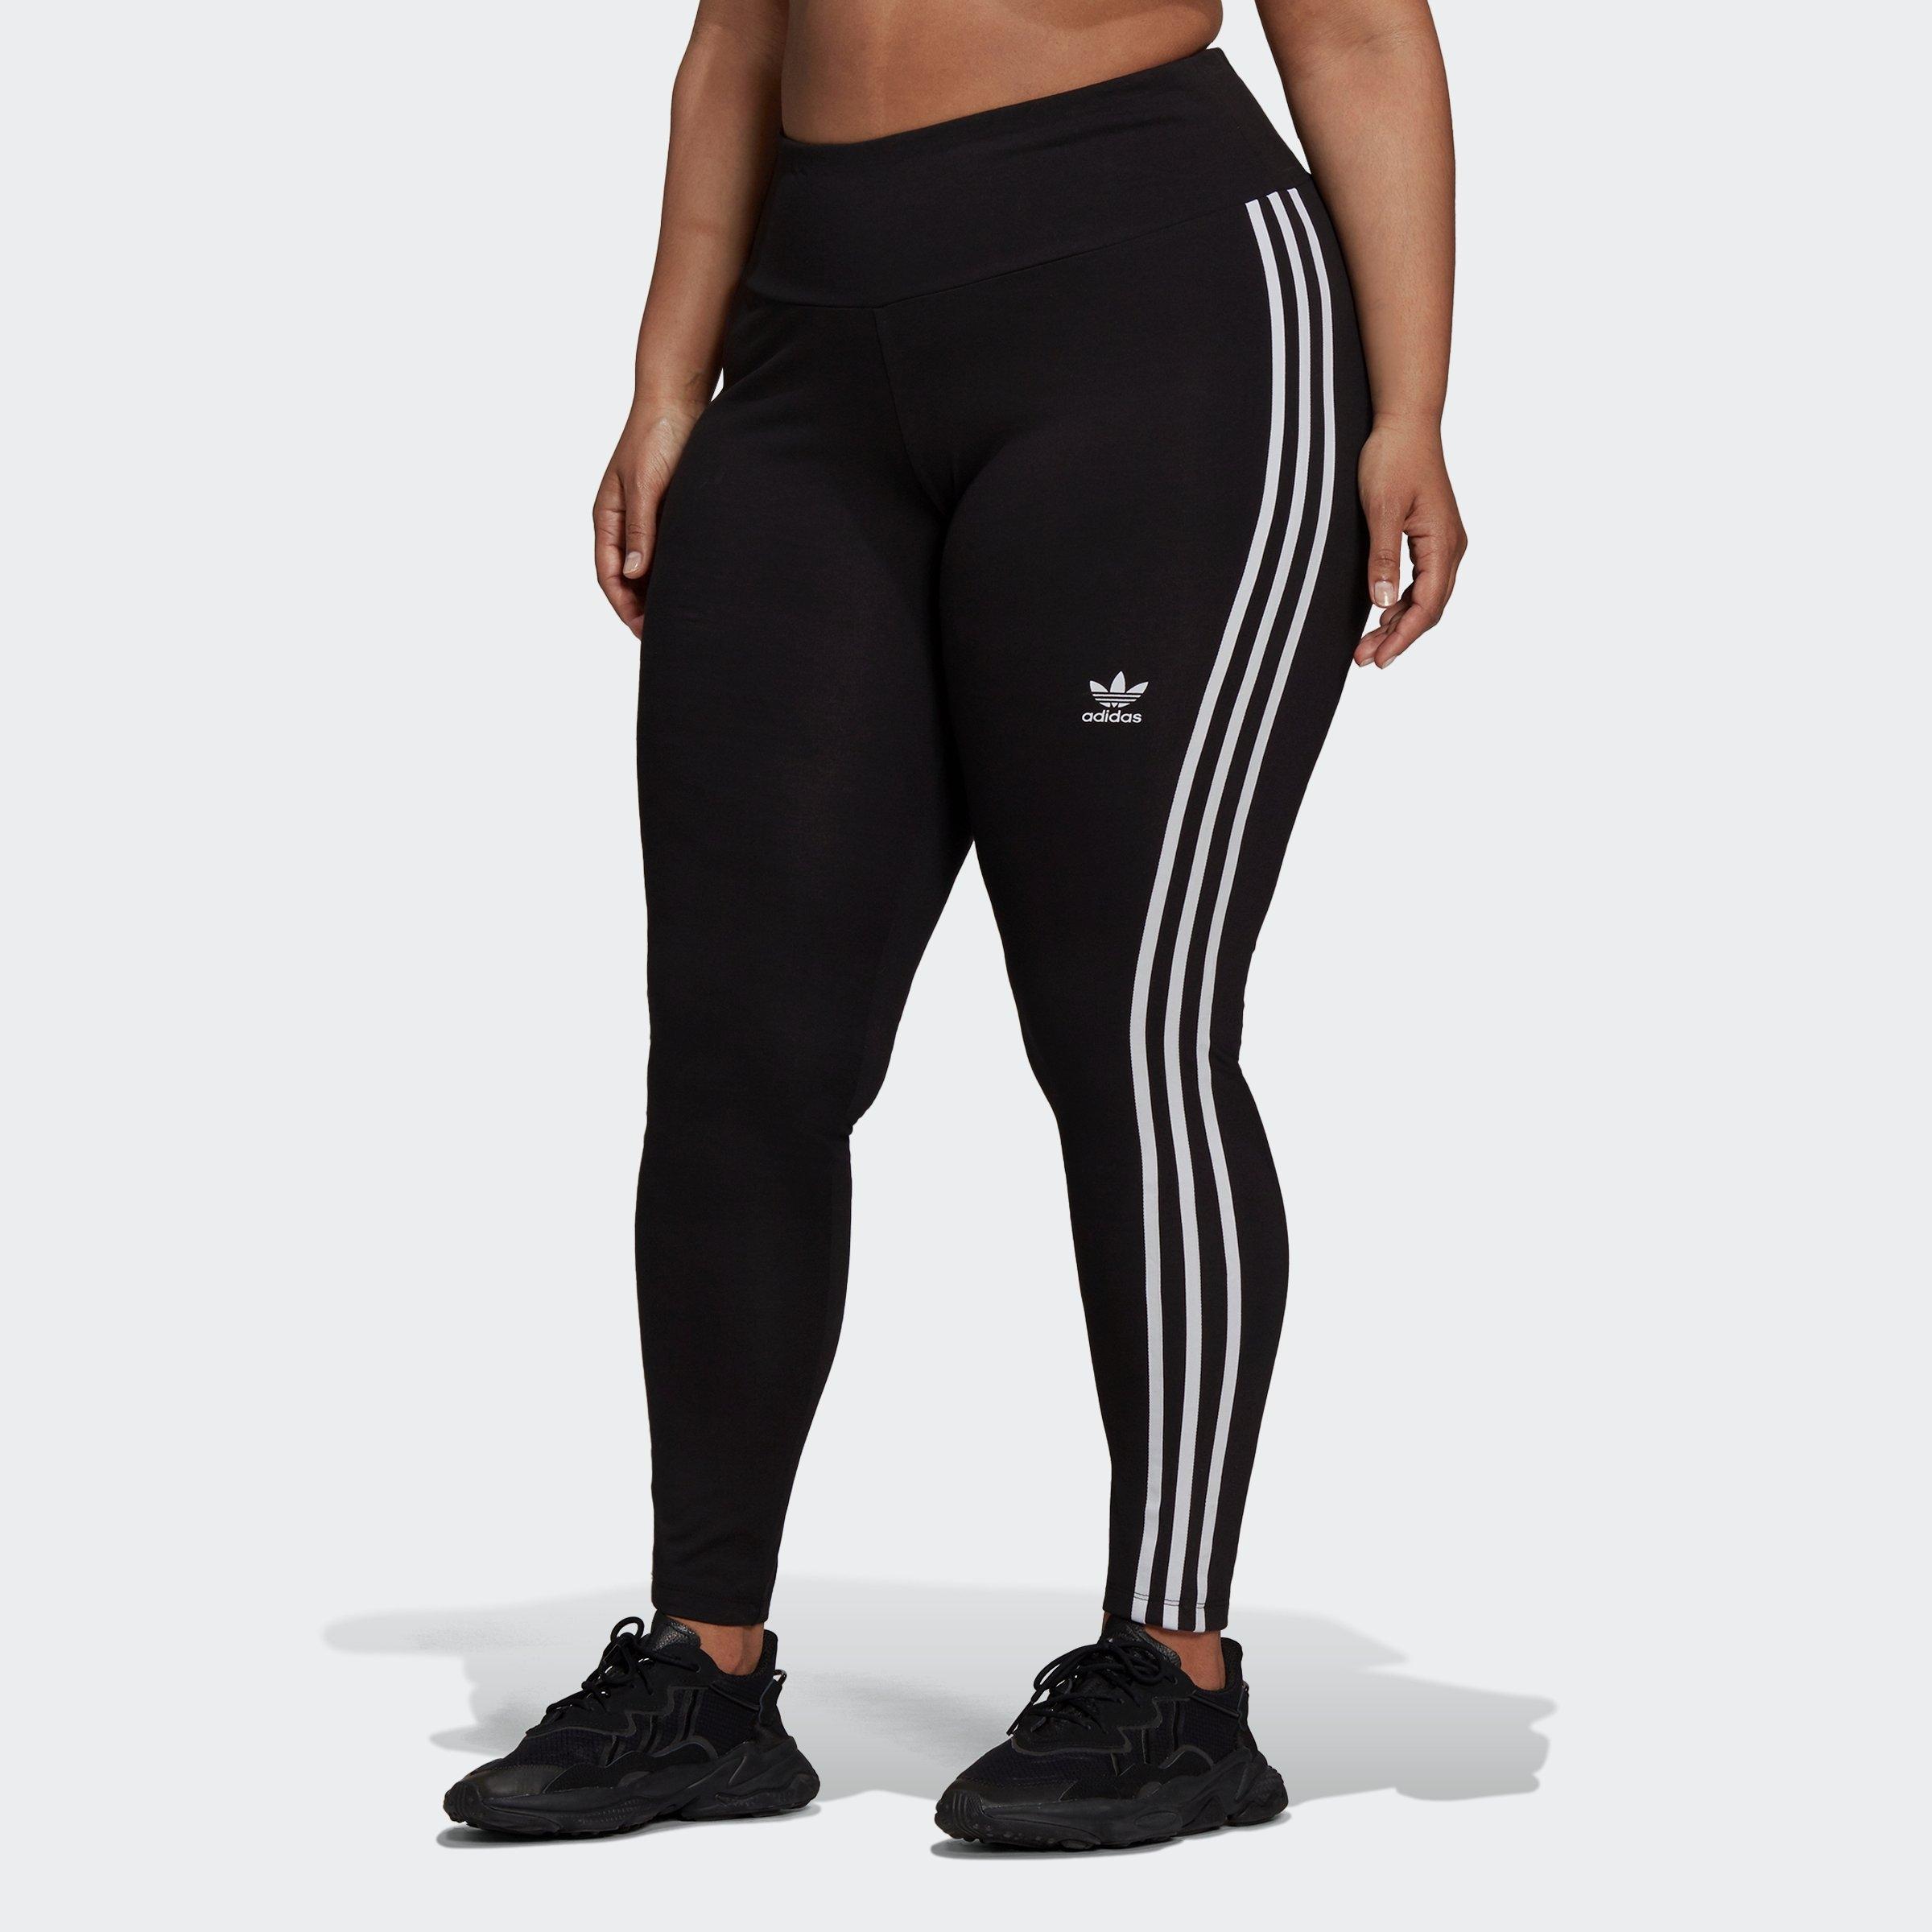 adidas Originals legging nu online bestellen